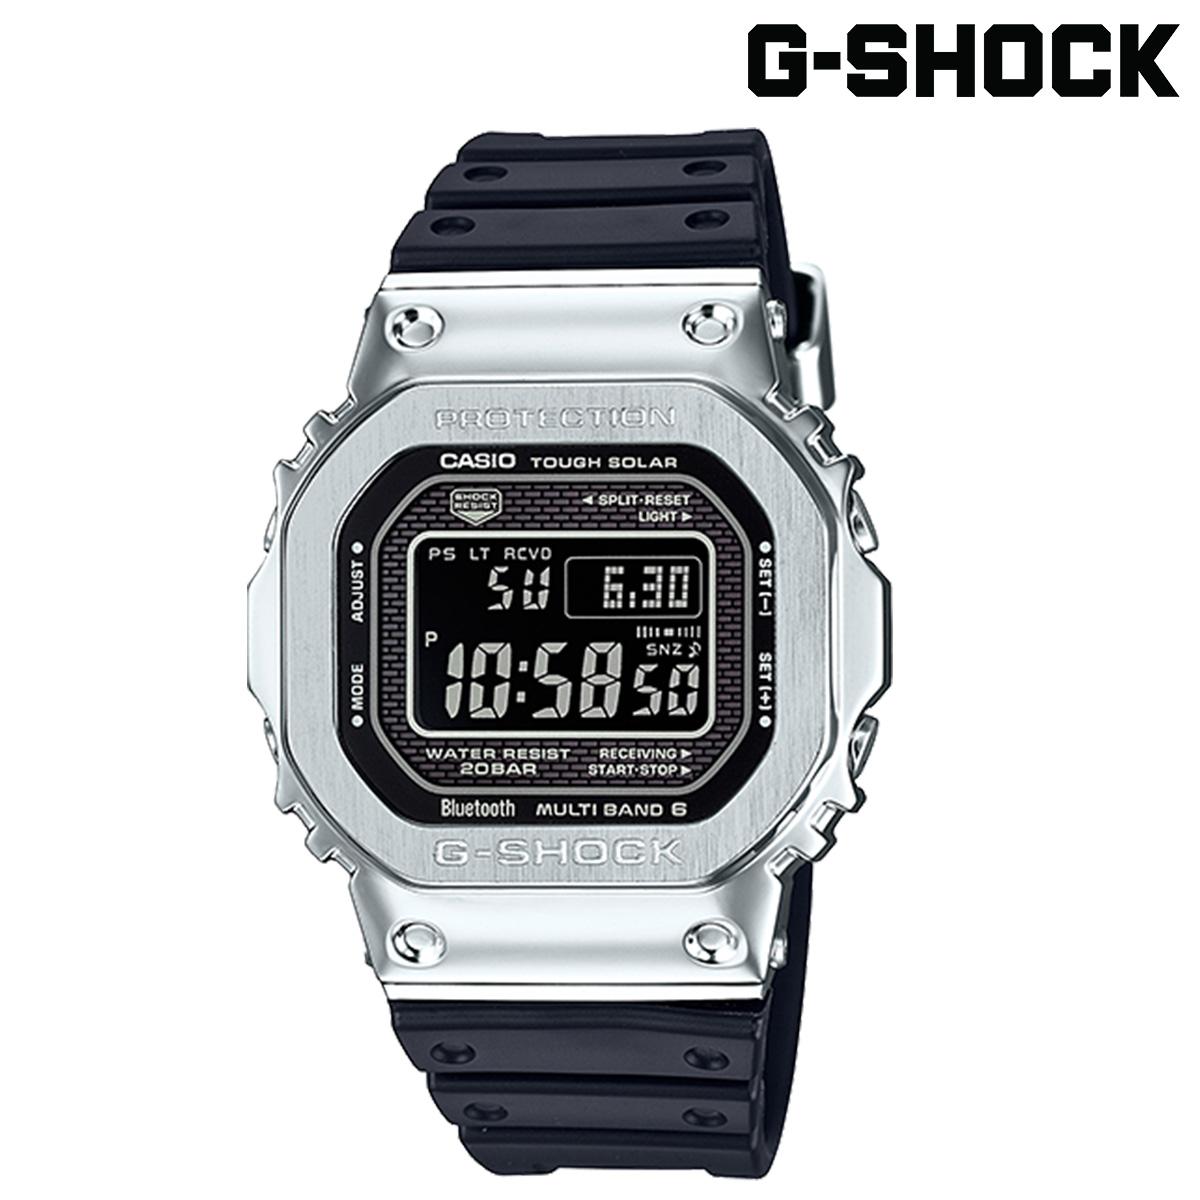 Casio Casio G Shock Watch Gmw B5000 1jf ジーショック G Shock G Shock Silver Men Gap Dis 7 19 Reentry Load